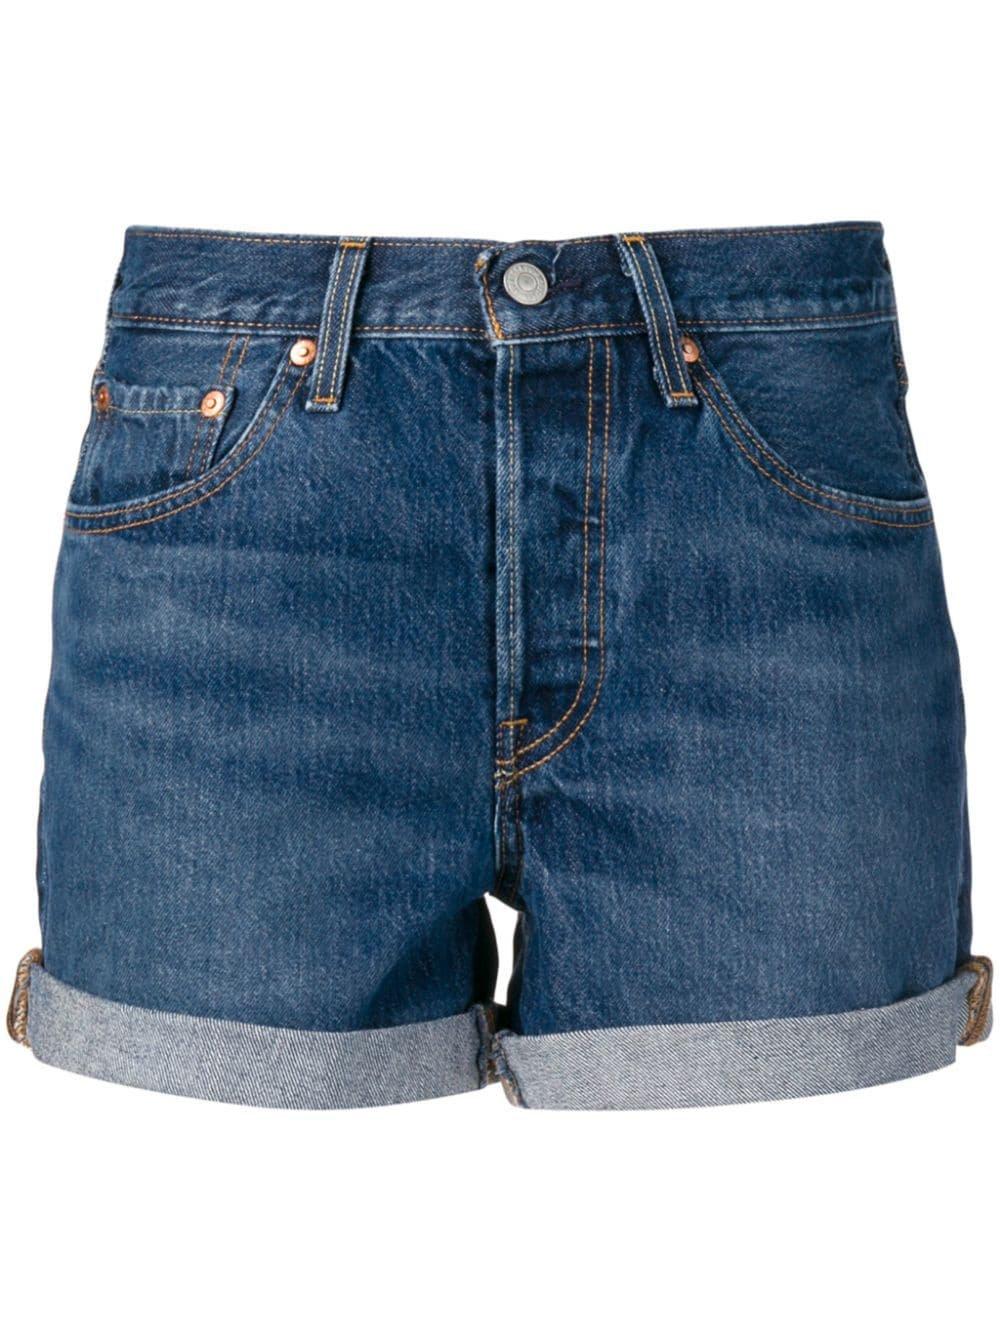 Levi's Short Denim Shorts - Farfetch